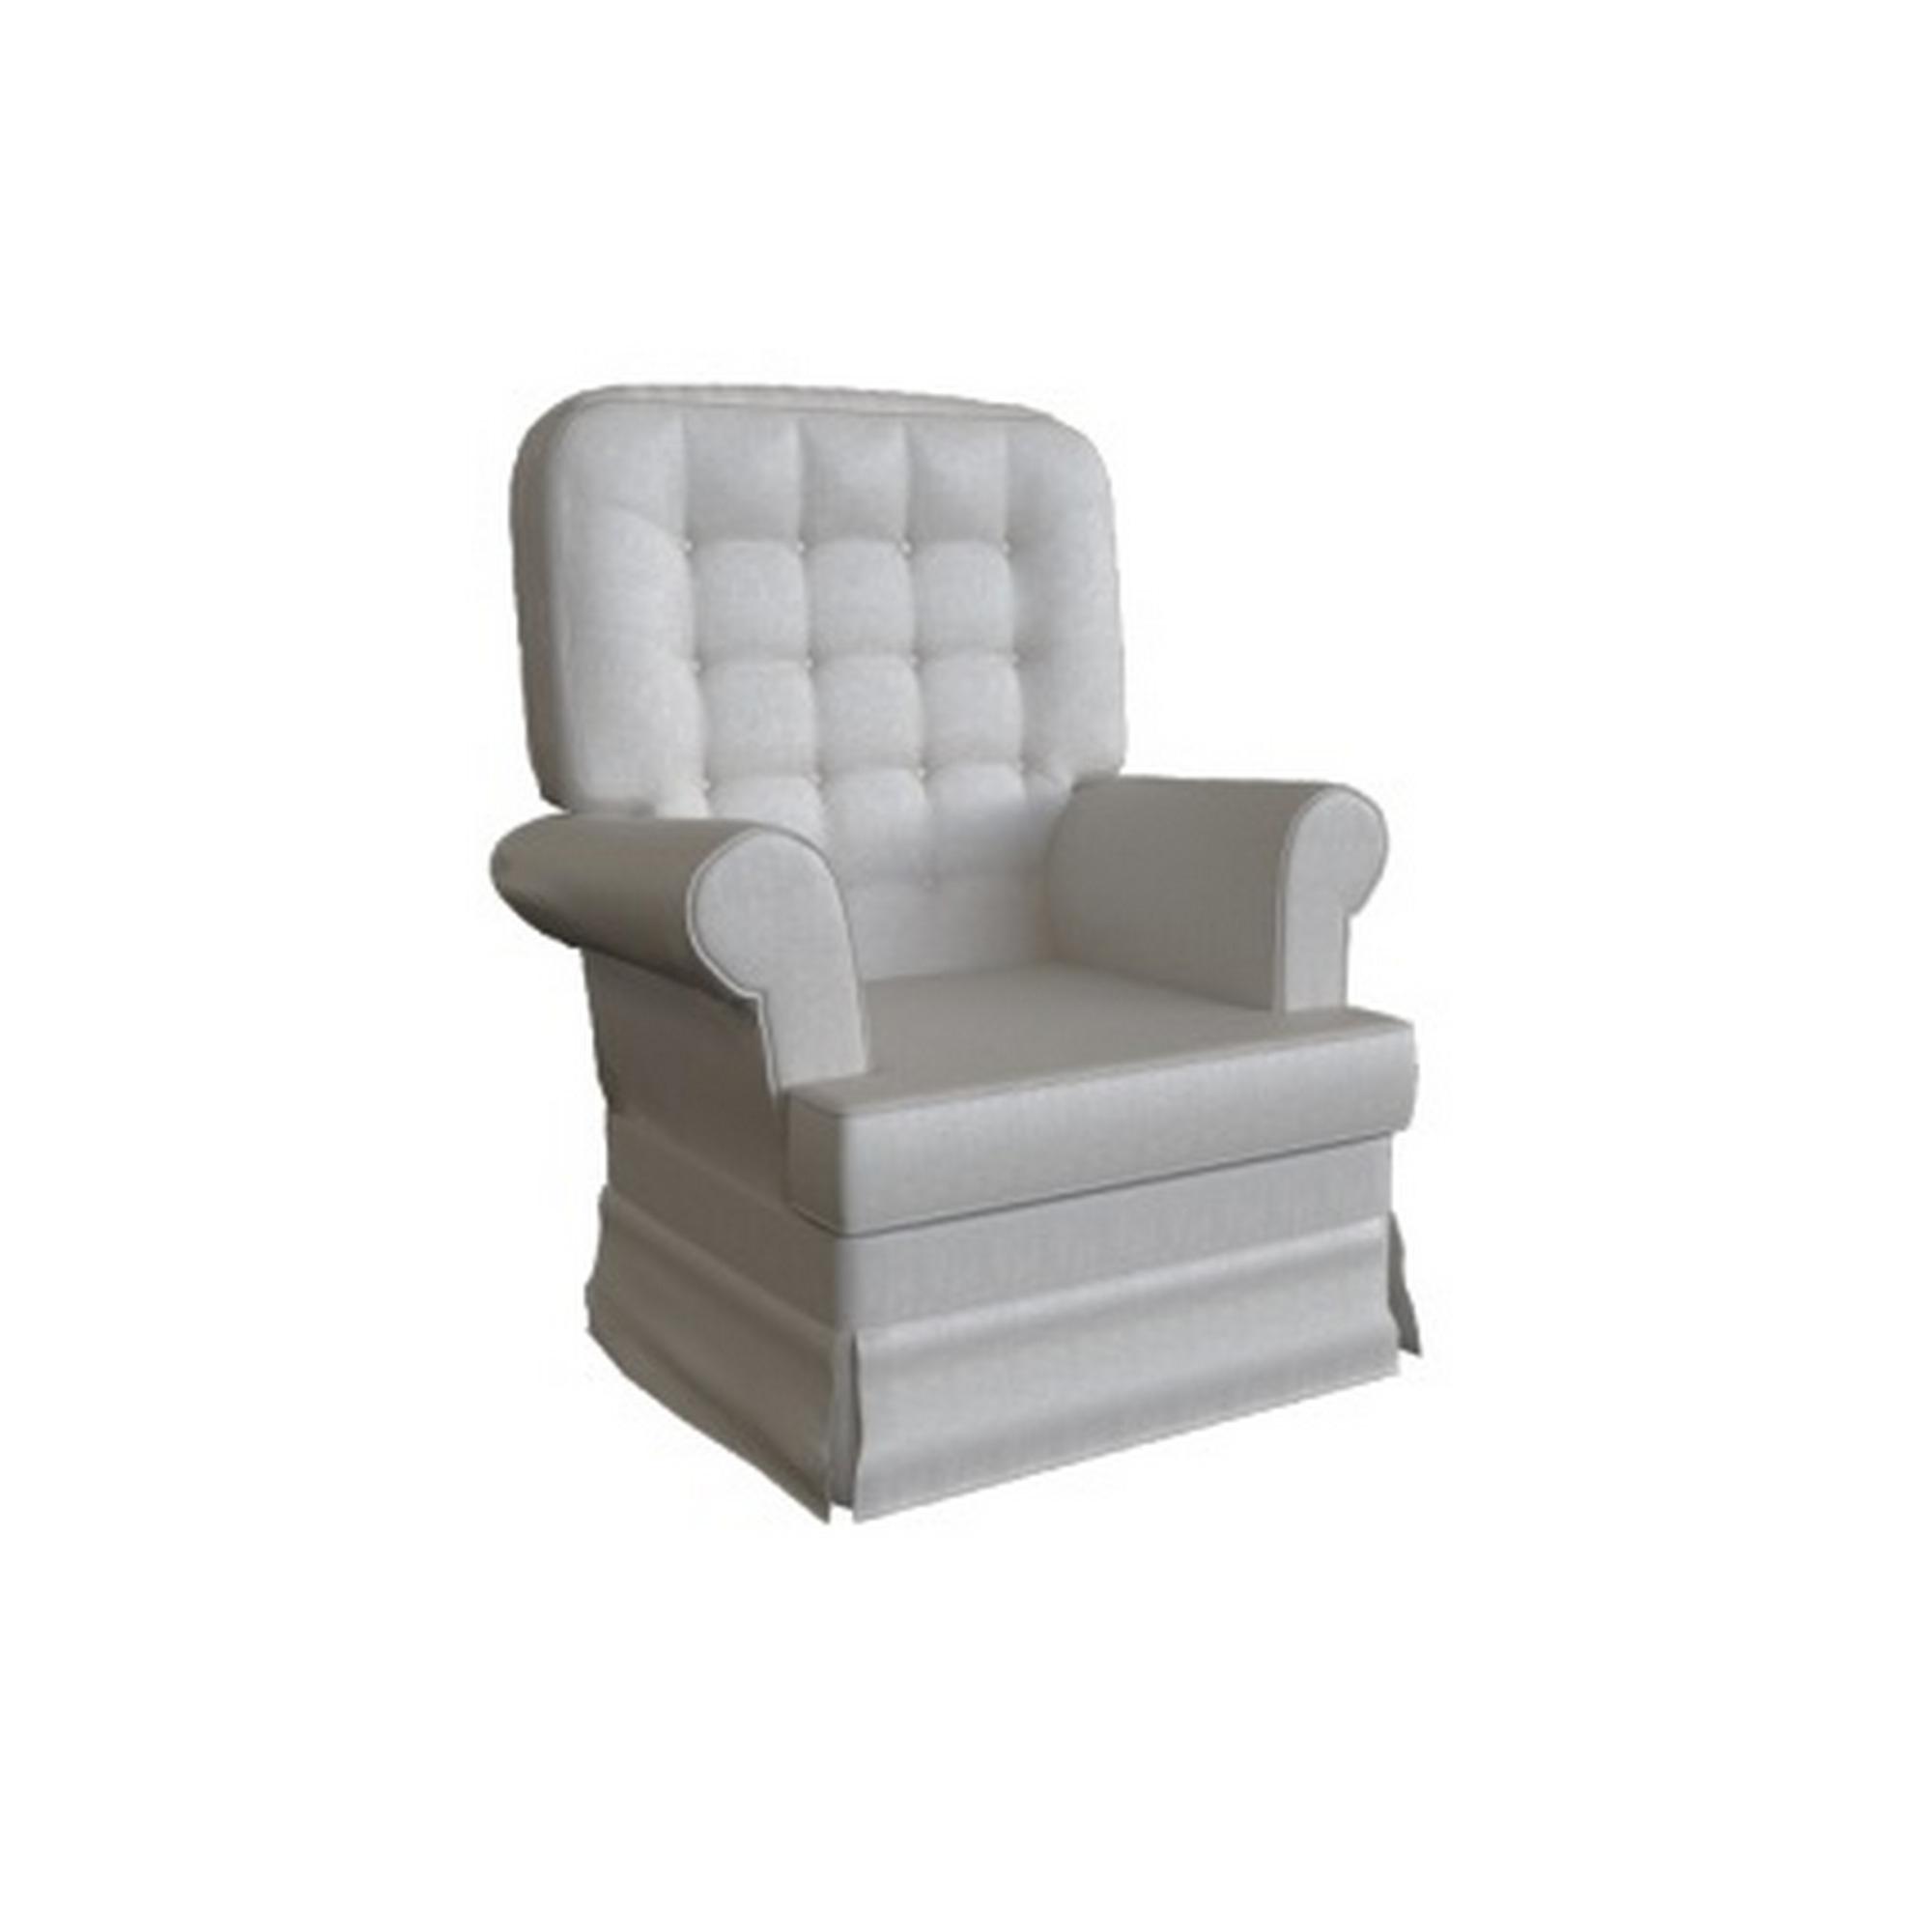 Poltrona Comfort Balanço Sarja Rustico Garnier